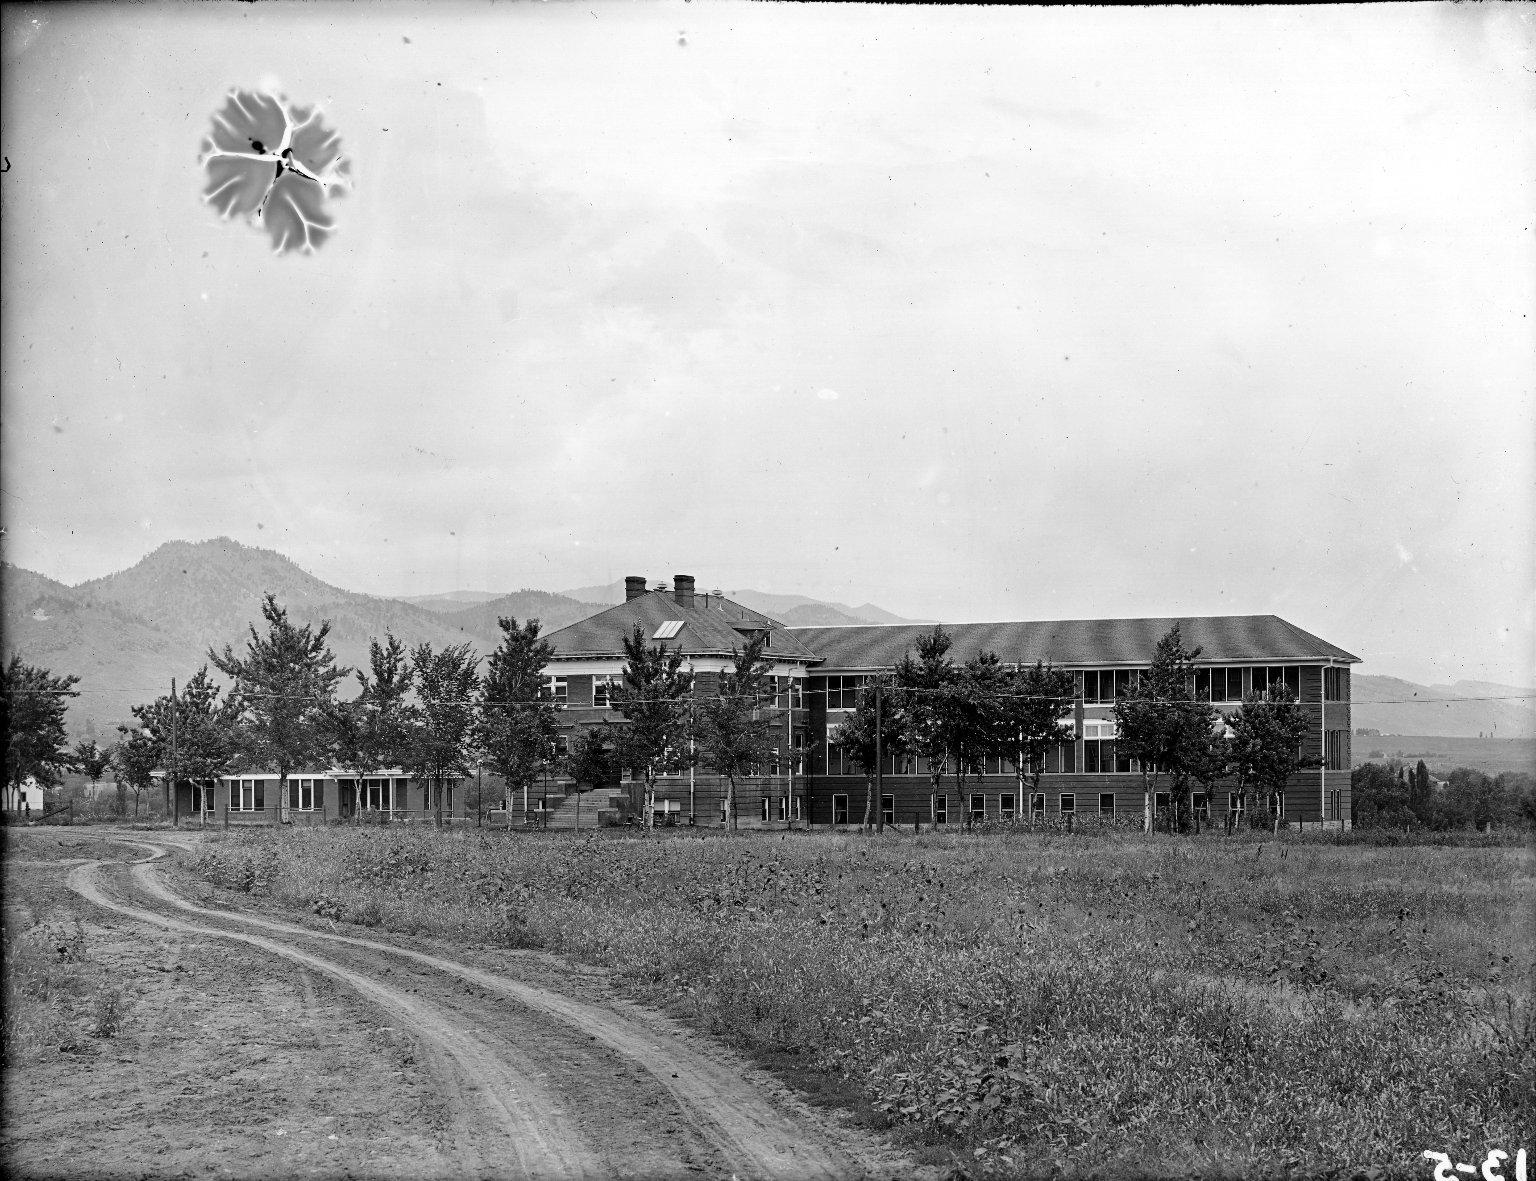 17th St. Hospital, W. Wing